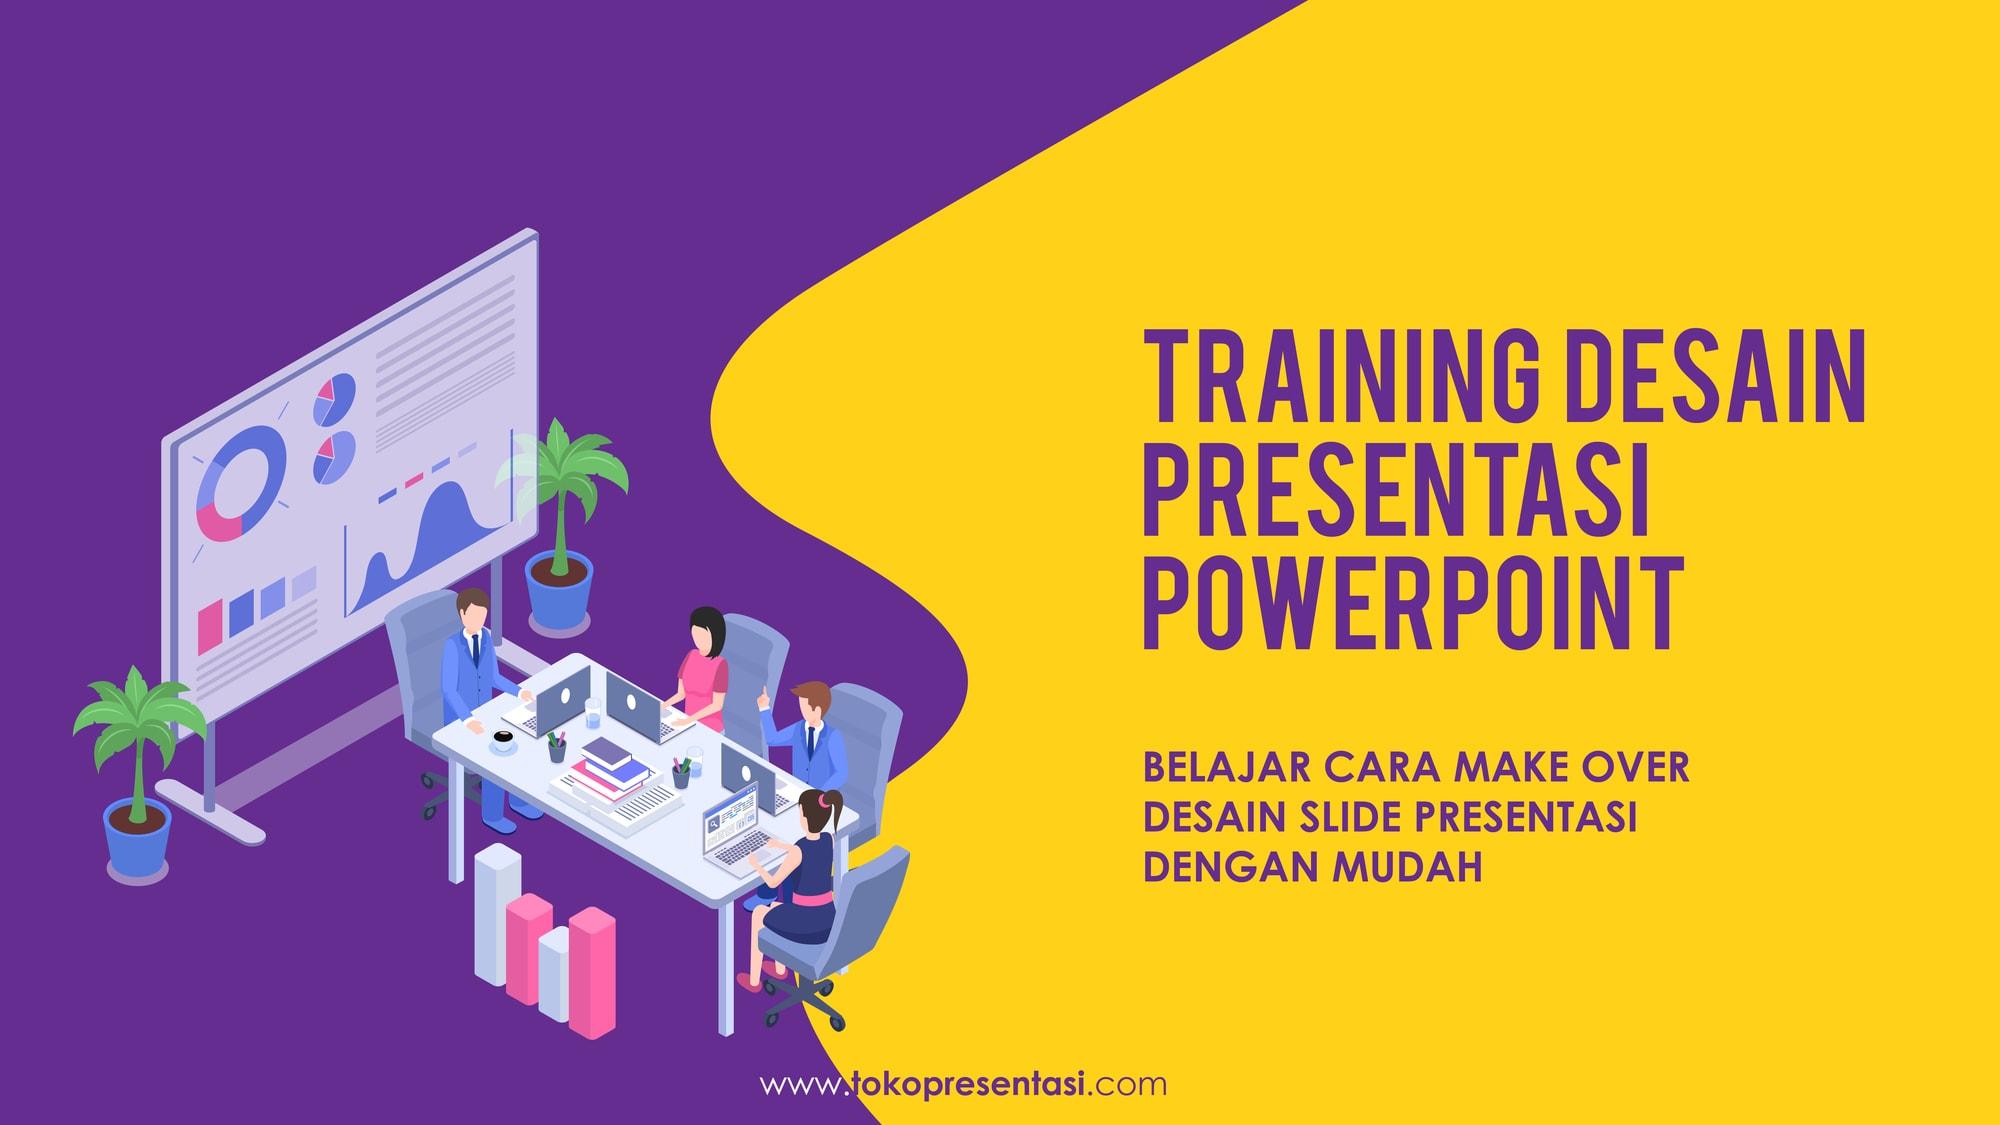 Pelatihan Desain Presentasi PowerPoint Komisi Perlindungan Anak Indonesia Tokopresentasi